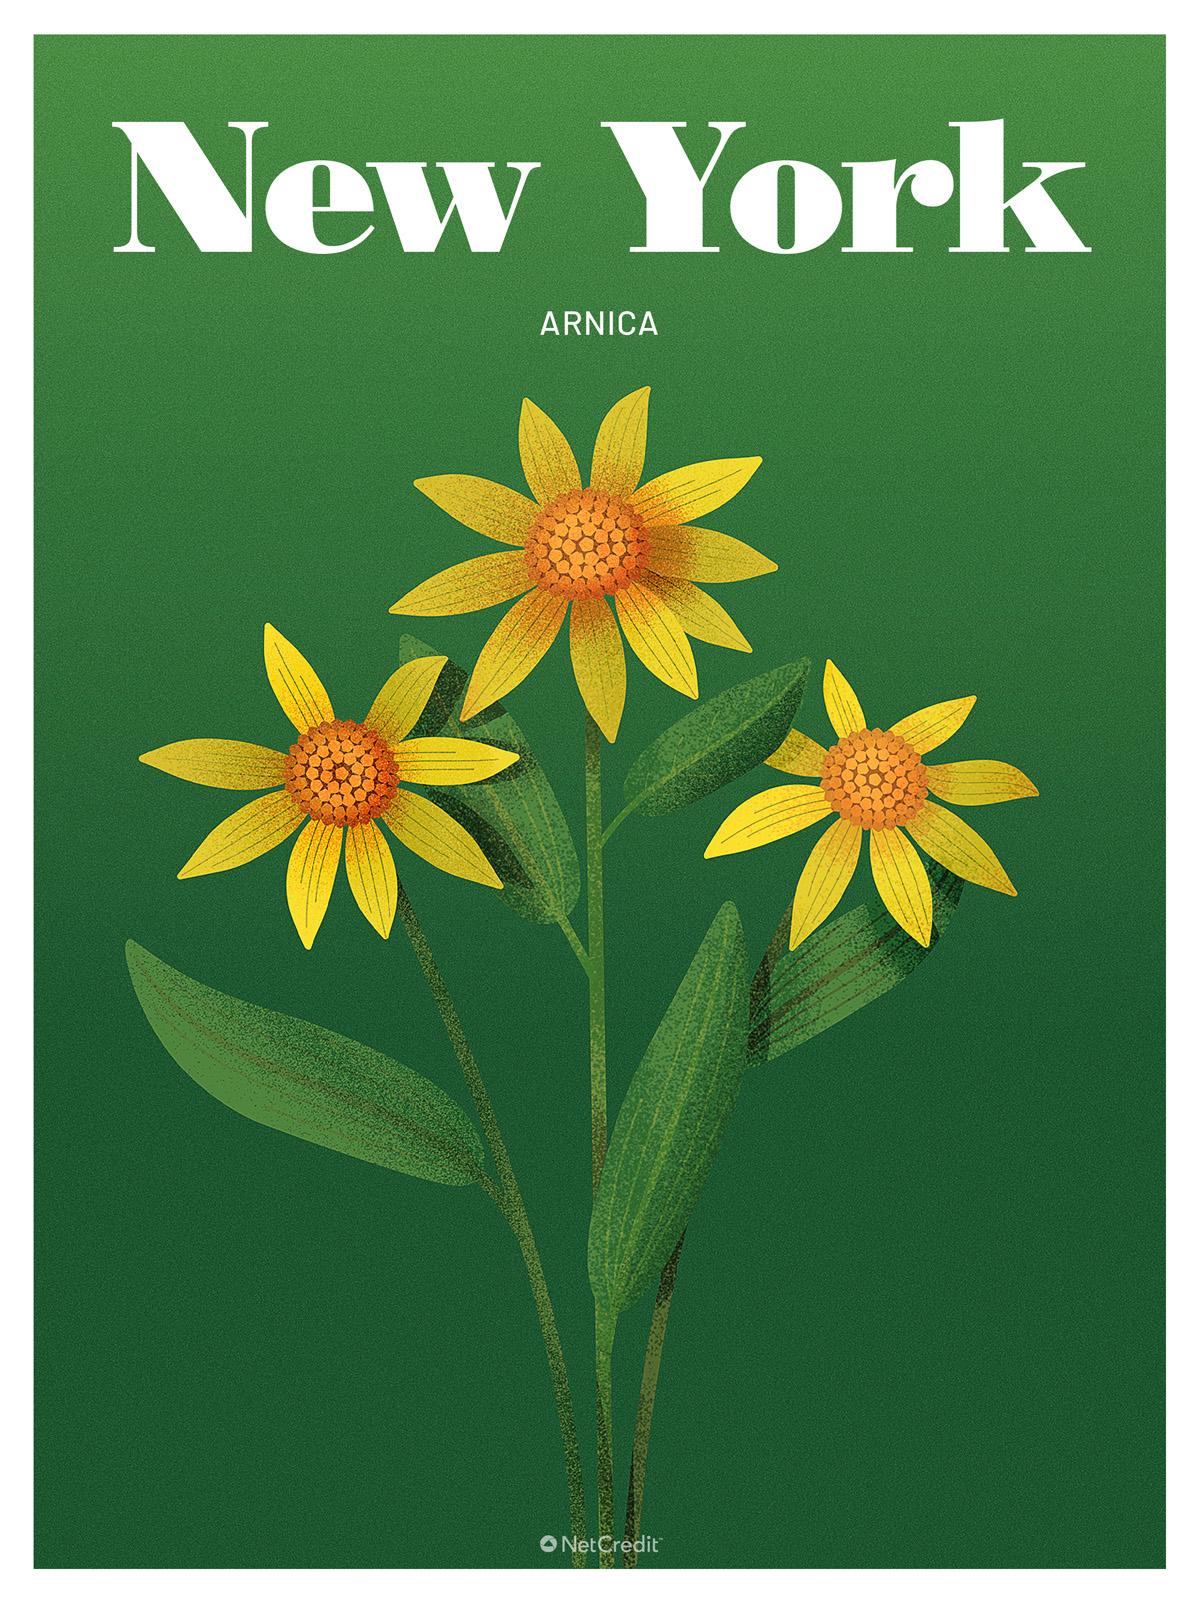 New York: Arnica